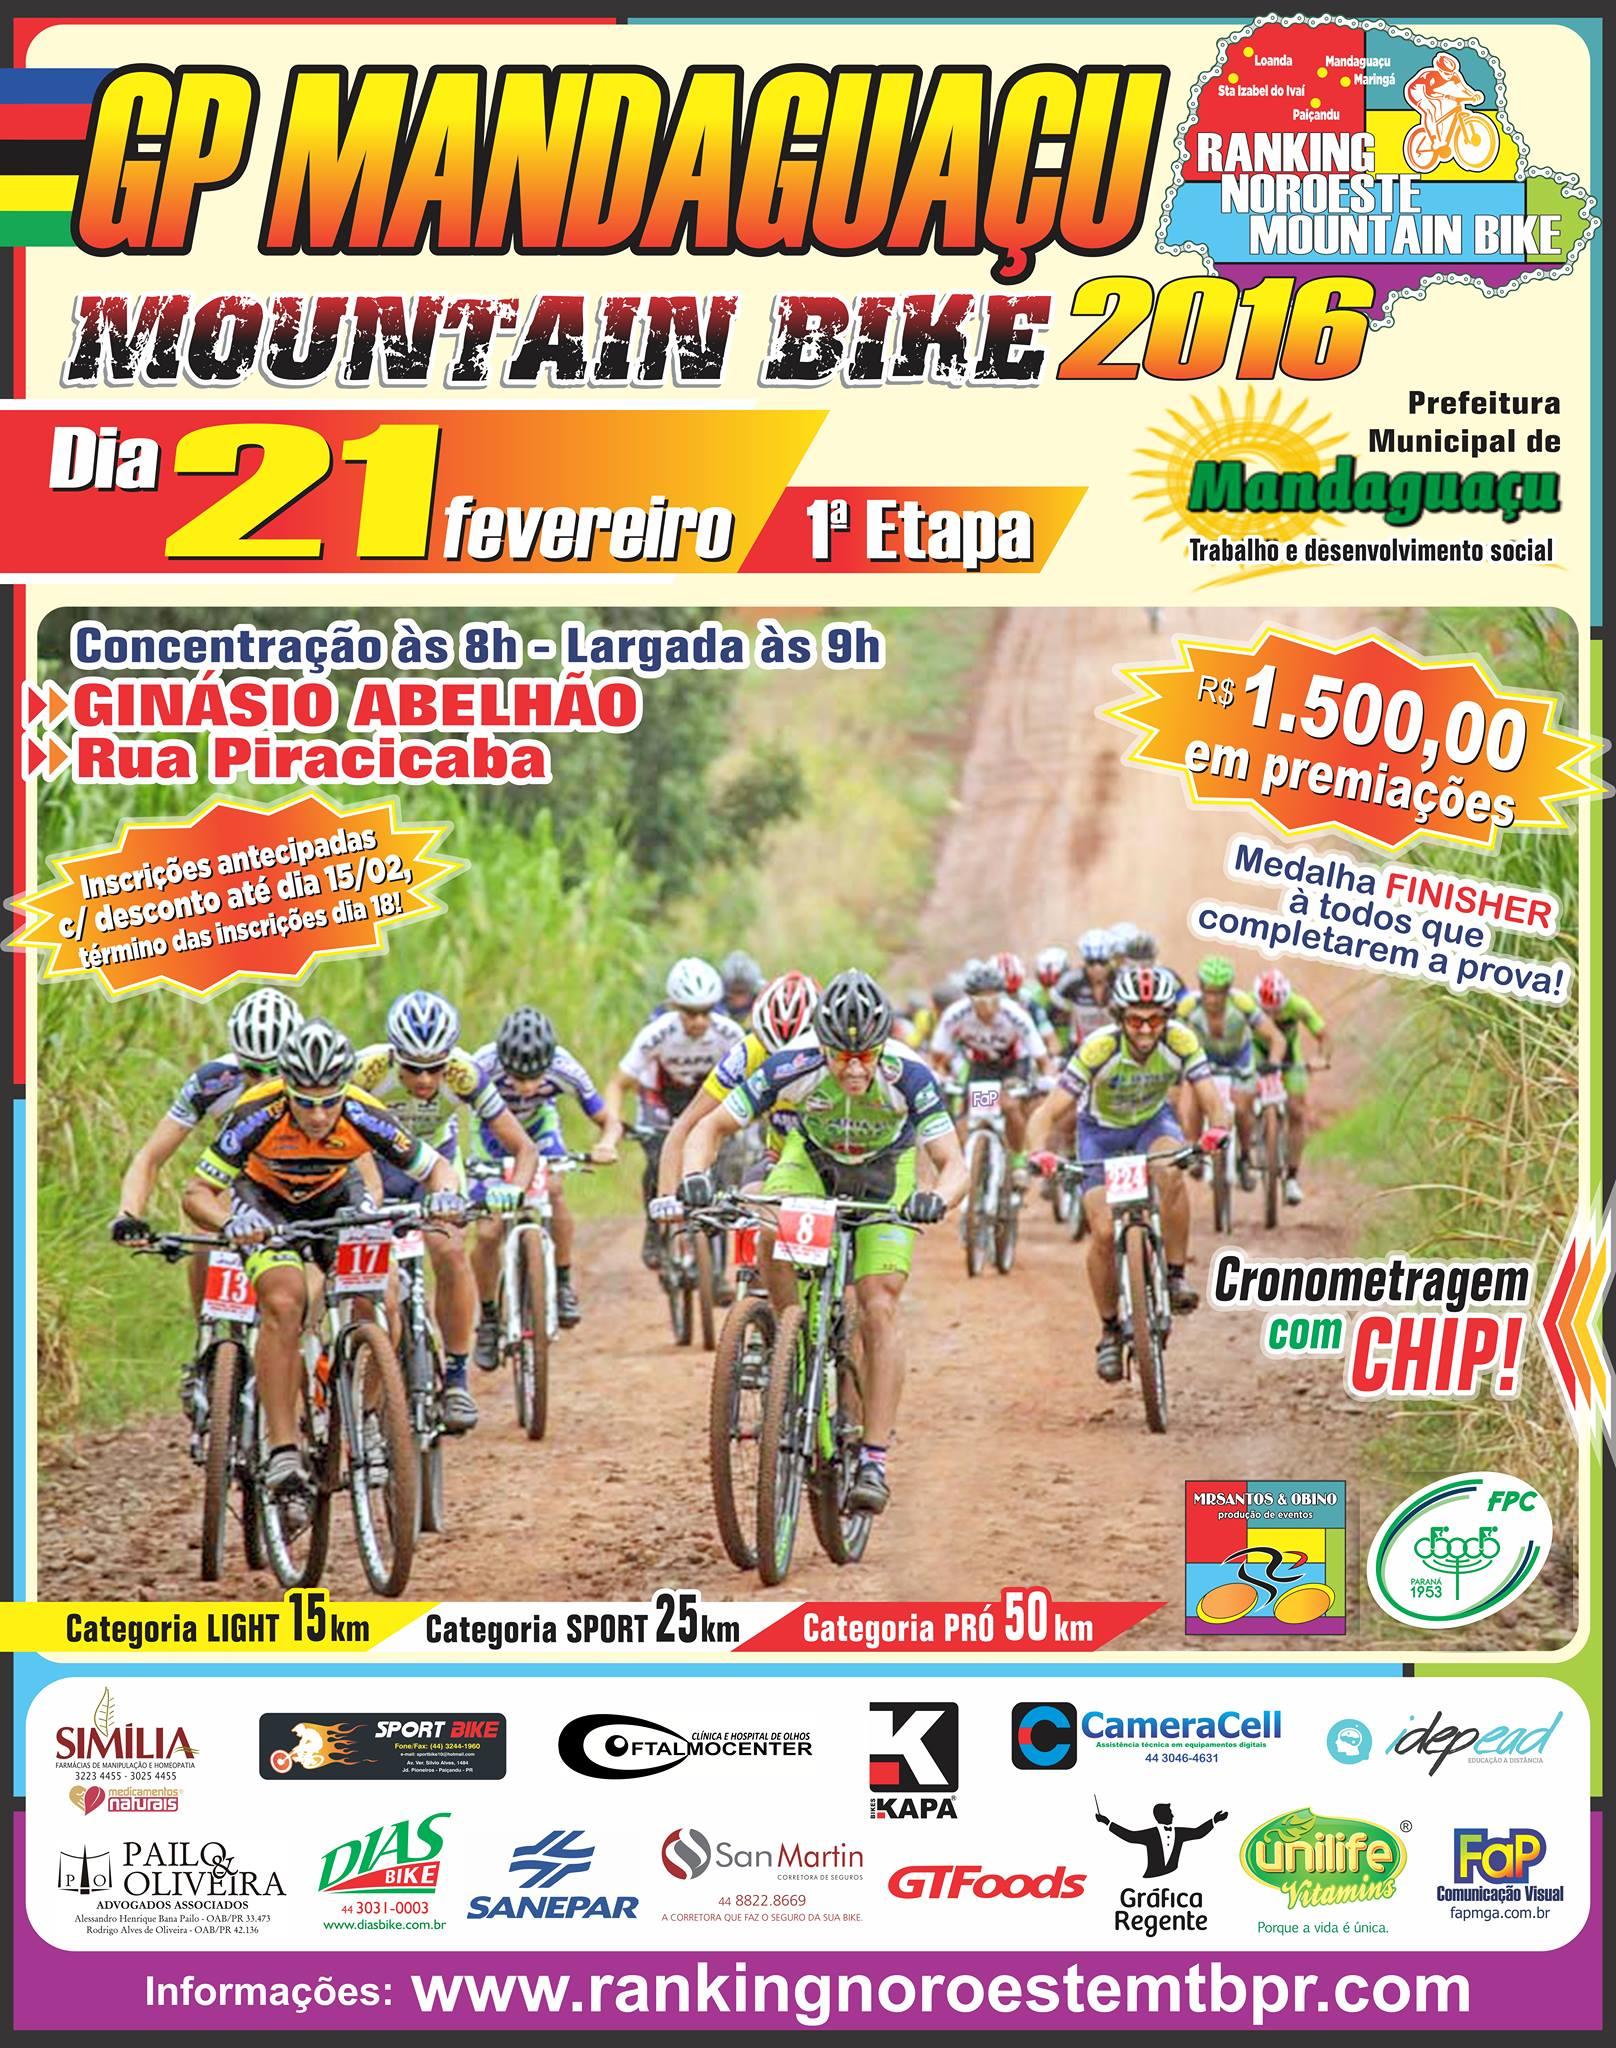 GP-Mandaguacu-Mountain-Bike-2016-disposicao-cartaz